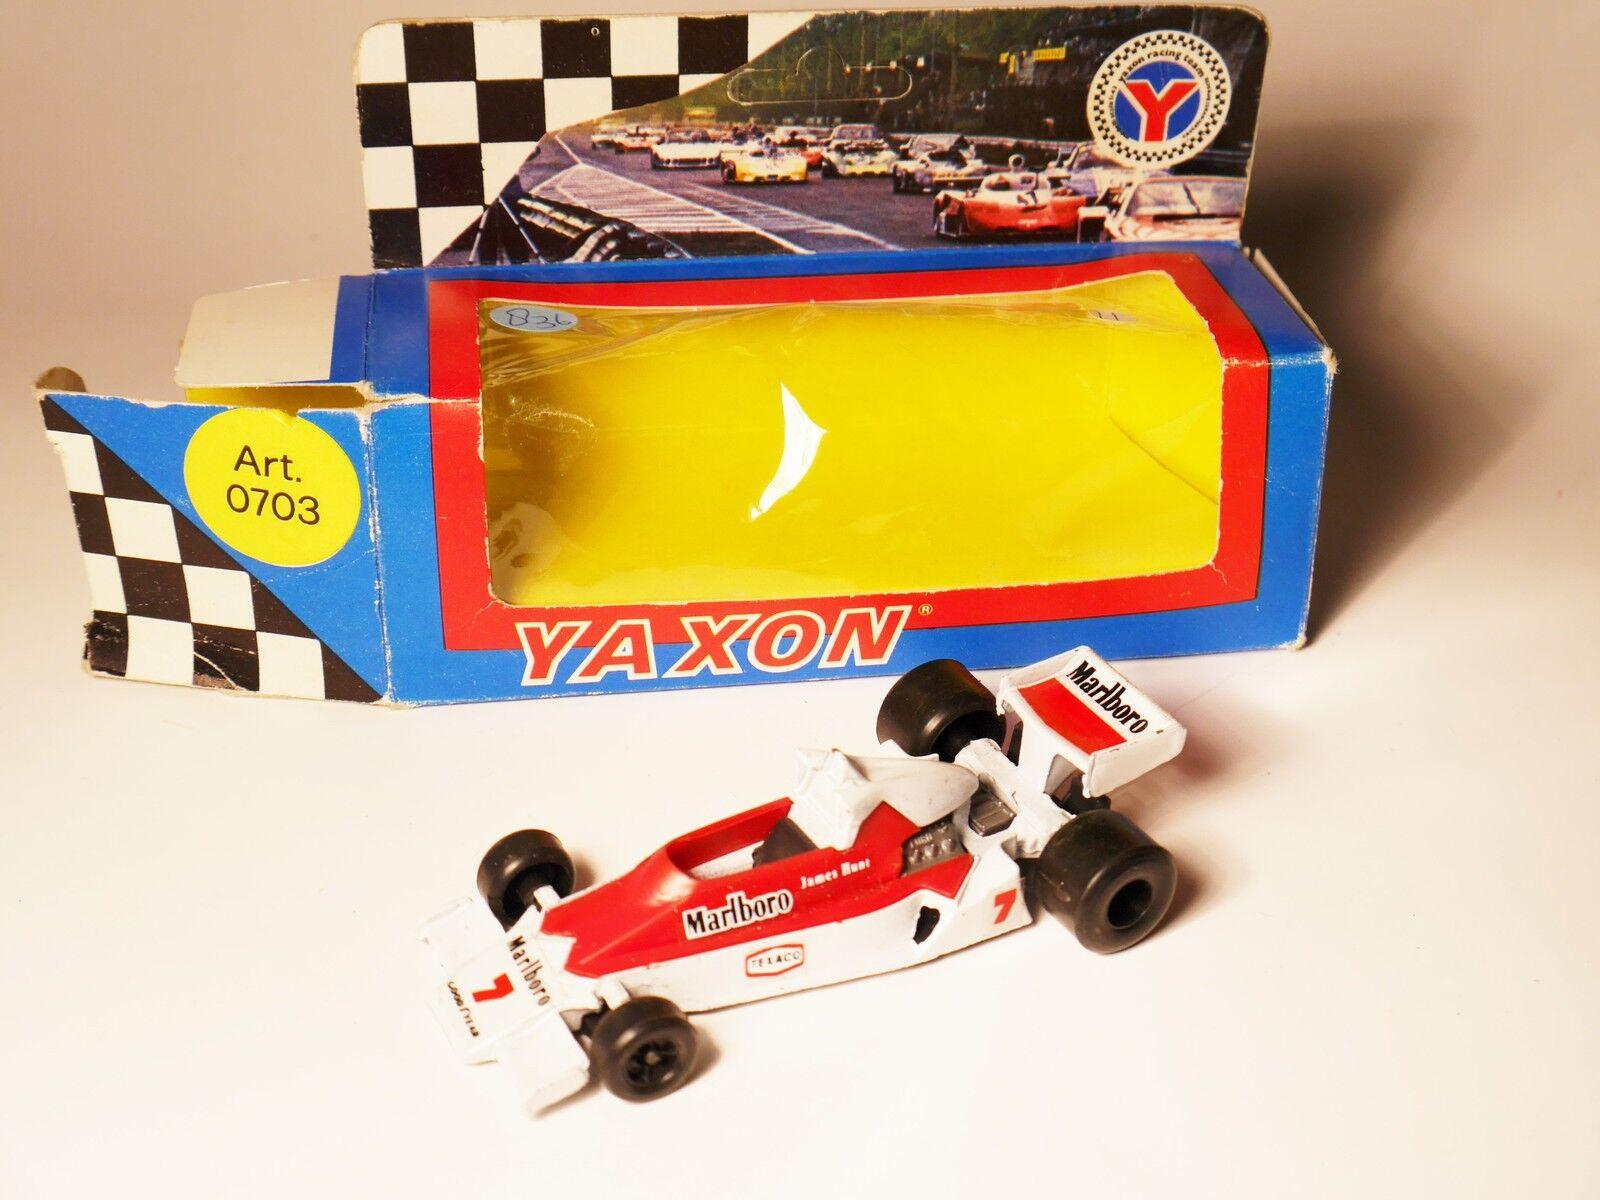 Mc Laren M 26 F1 Formel 1 Rennwagen racing car car car JAMES HUNT Yaxon 1 43 boxed  78543d